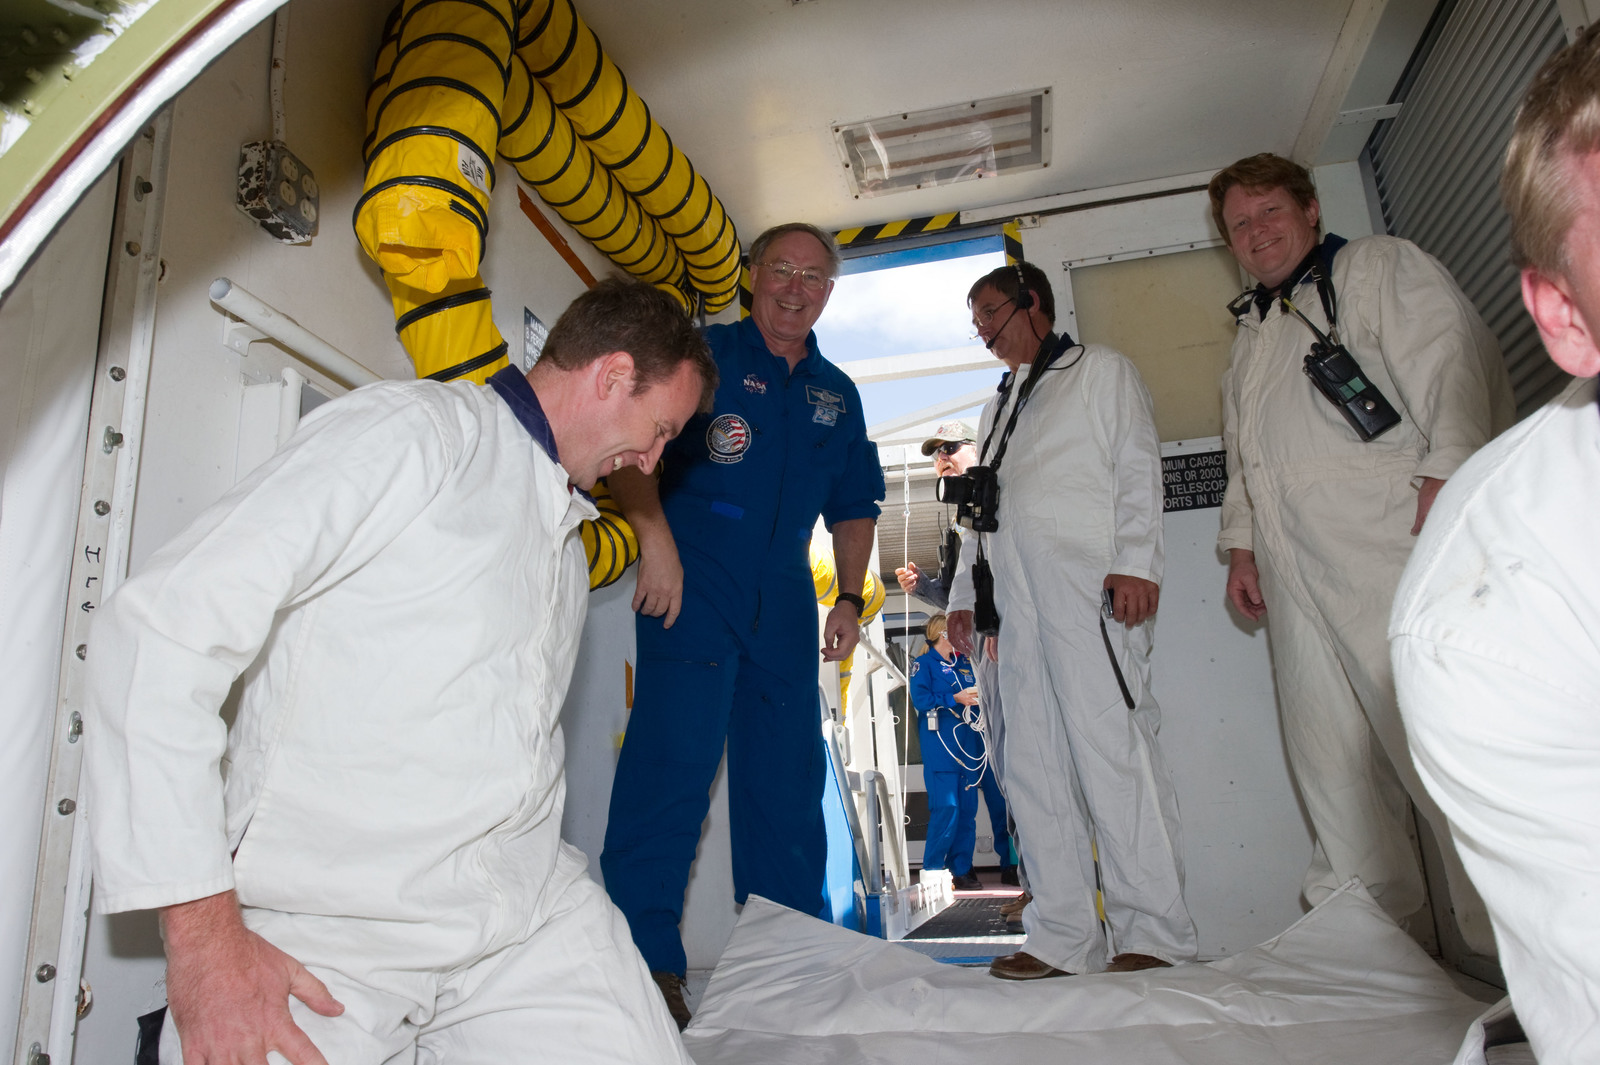 s133E013588 - STS-133 - Post landing